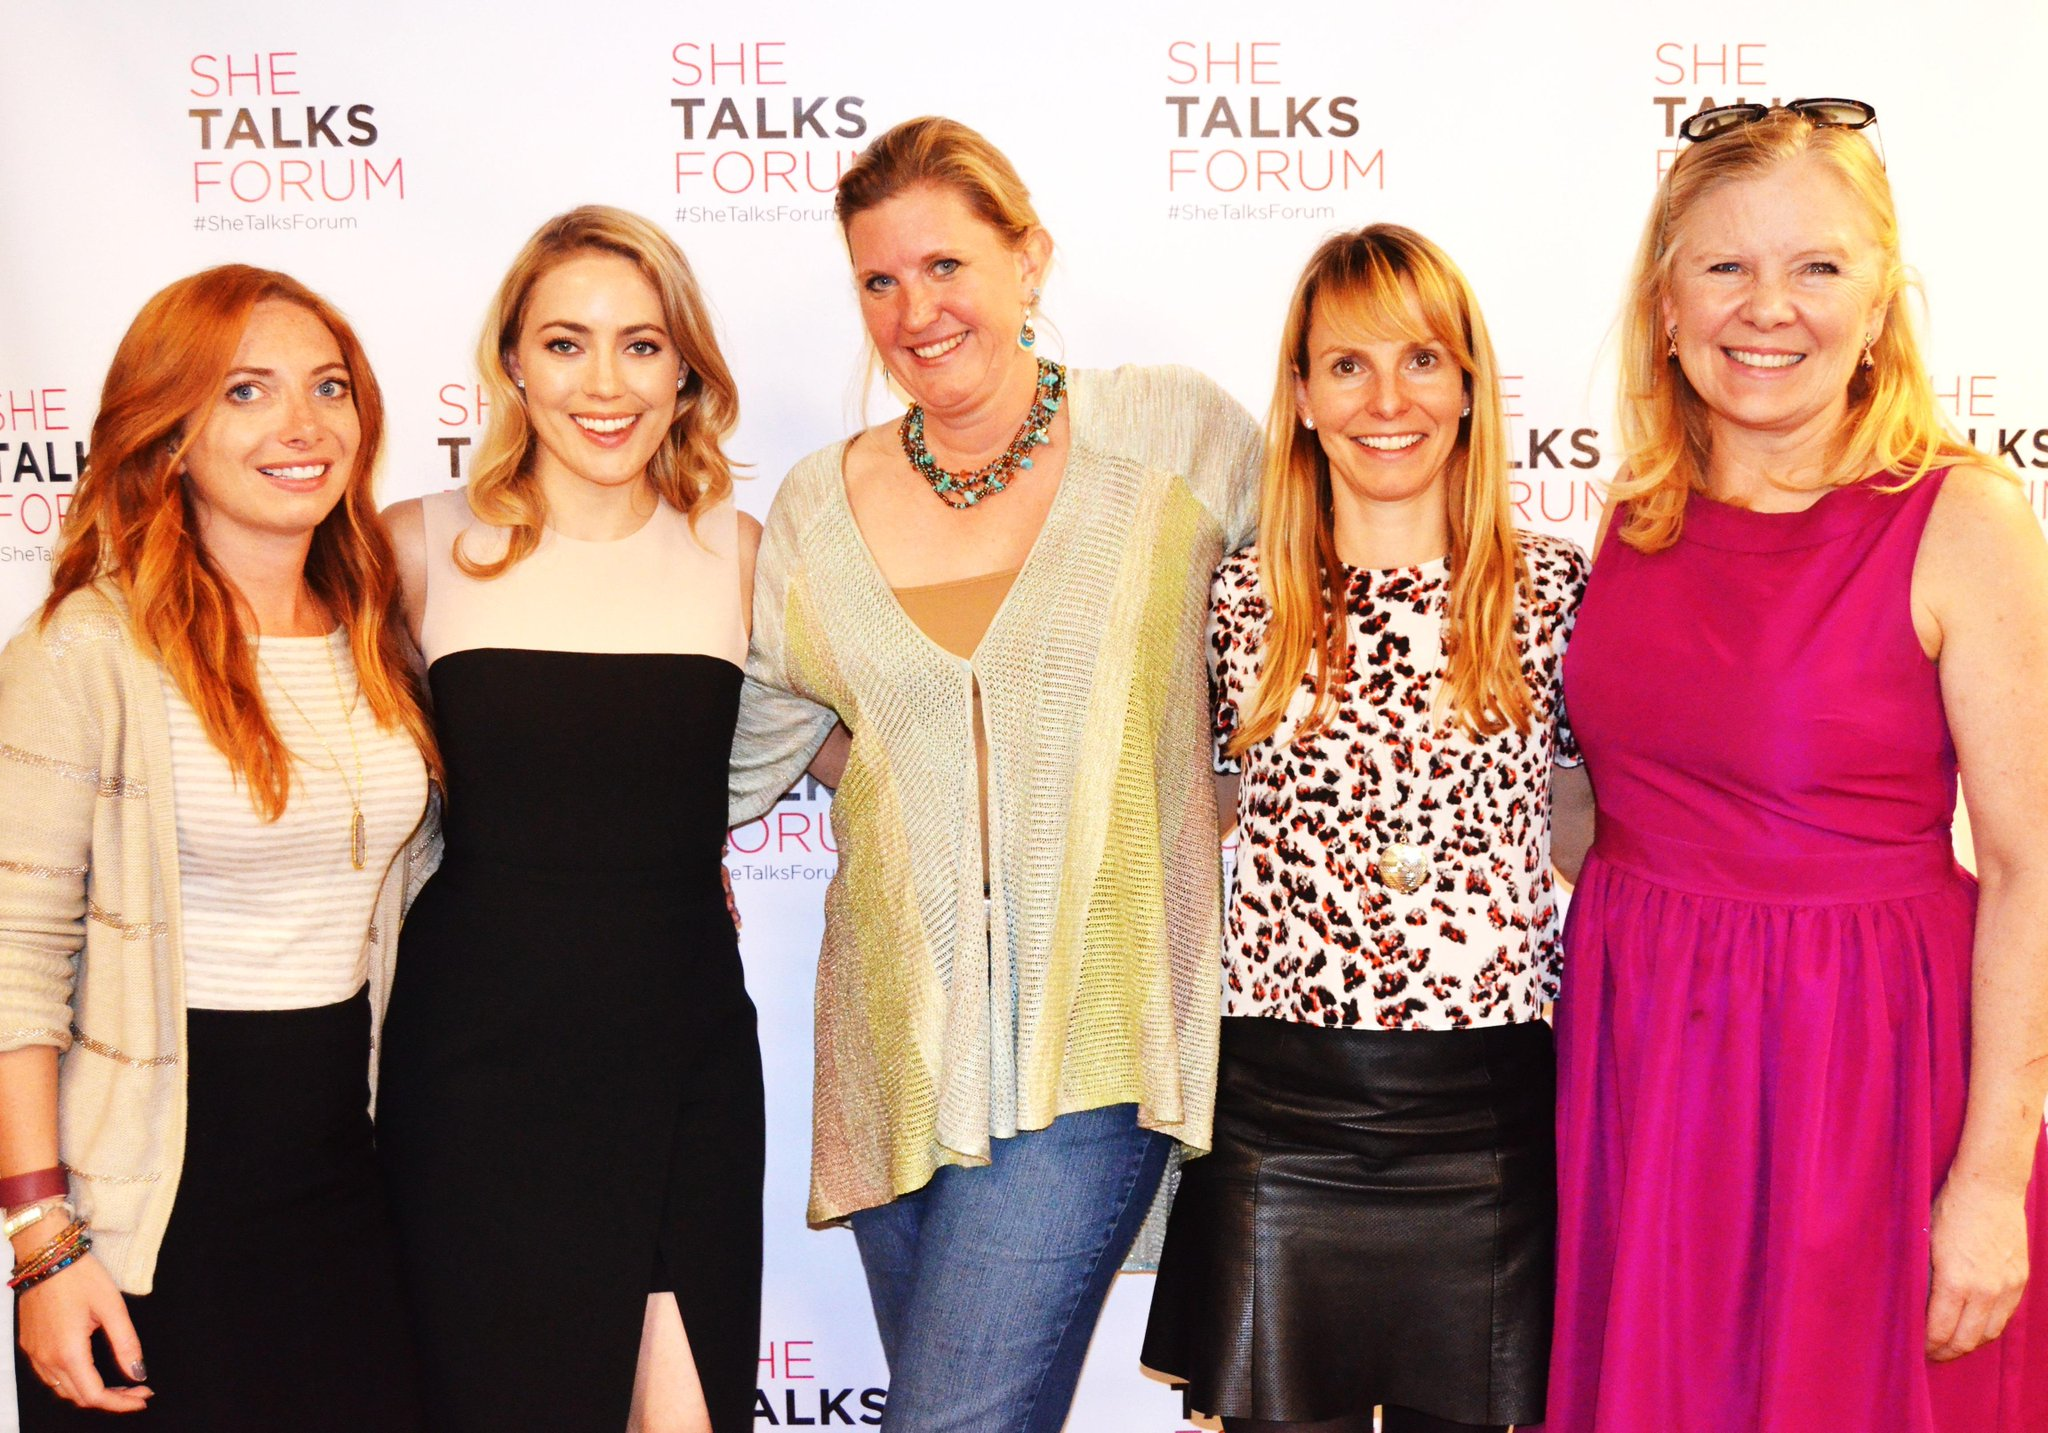 THANKS to @RachelFisch @krmcphee @HeatherFurby @heidizaks @laynegray #SheTalksForum inspiring #womenentrepreneurs http://t.co/5sVzJ74dNw